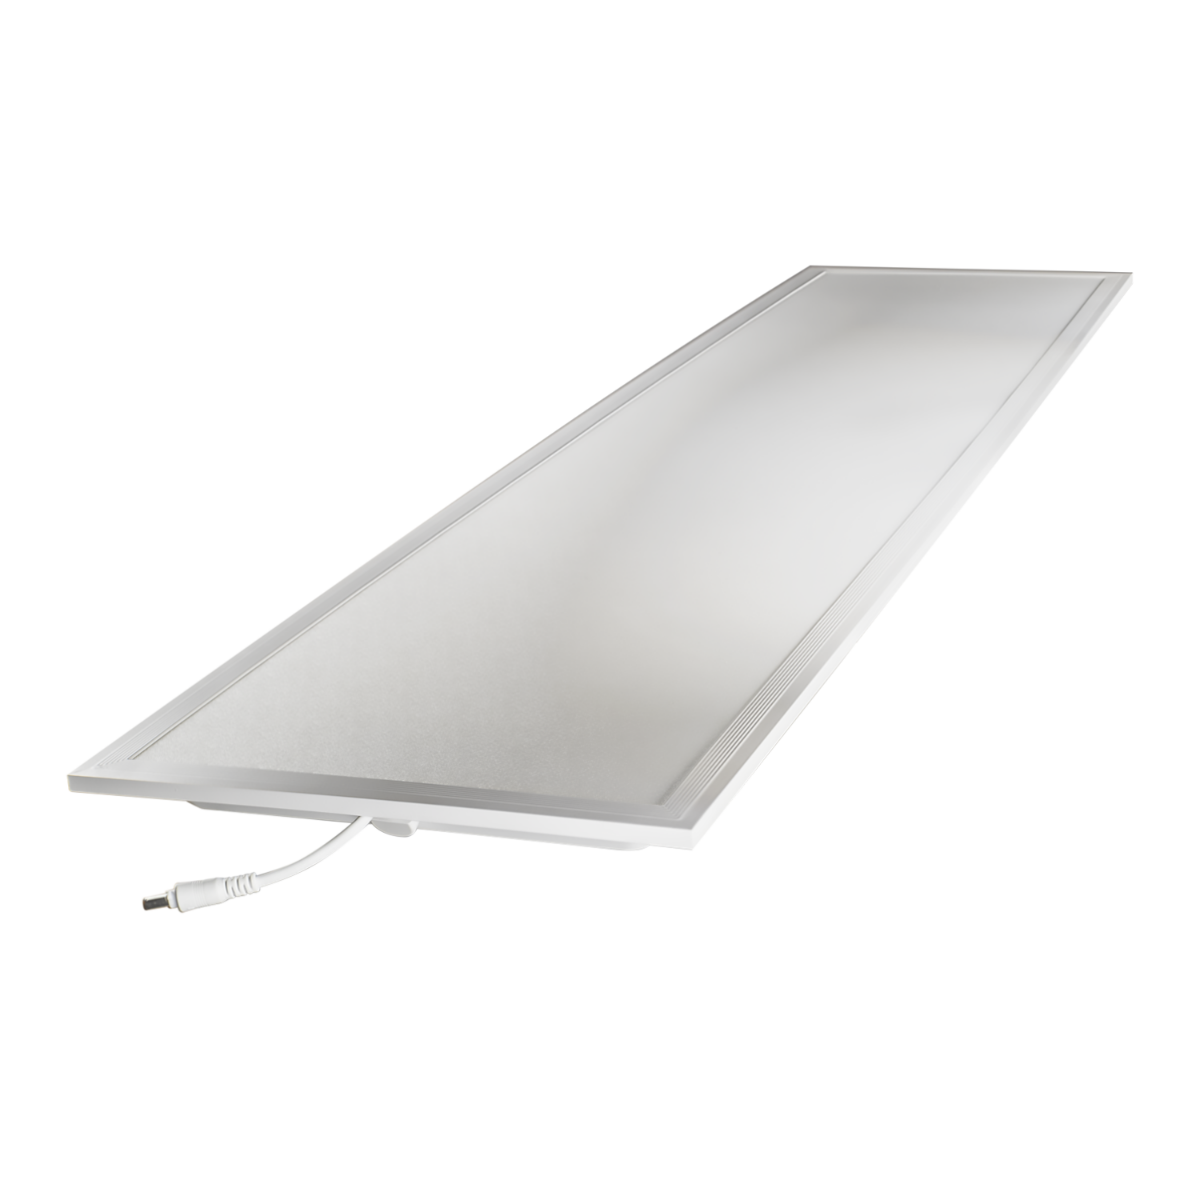 Noxion Panel LED Delta Pro V2.0 30W 30x120cm 6500K 4110lm UGR <19 | Luz de Día - Reemplazo 2x36W